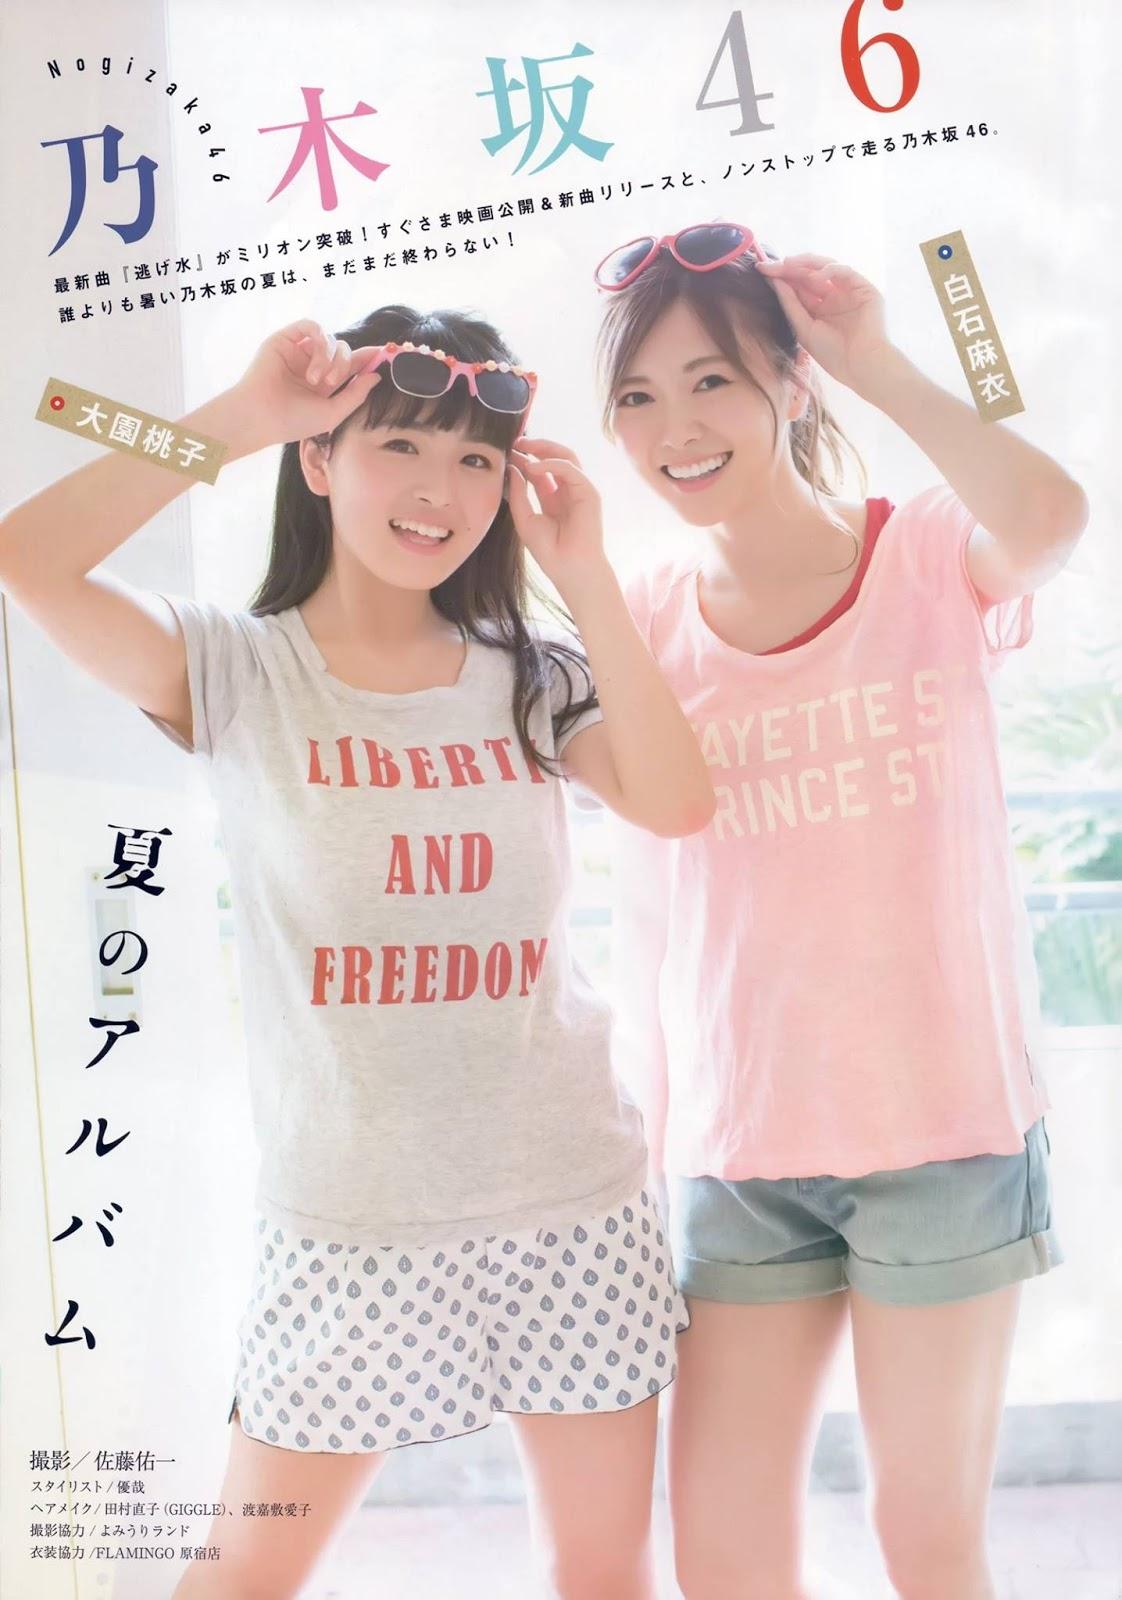 Shiraishi Mai 白石麻衣, Ozono Momoko 大園桃子, Monthly Young Magazine 2017.10 (月刊ヤングマガジン 2017年10号)